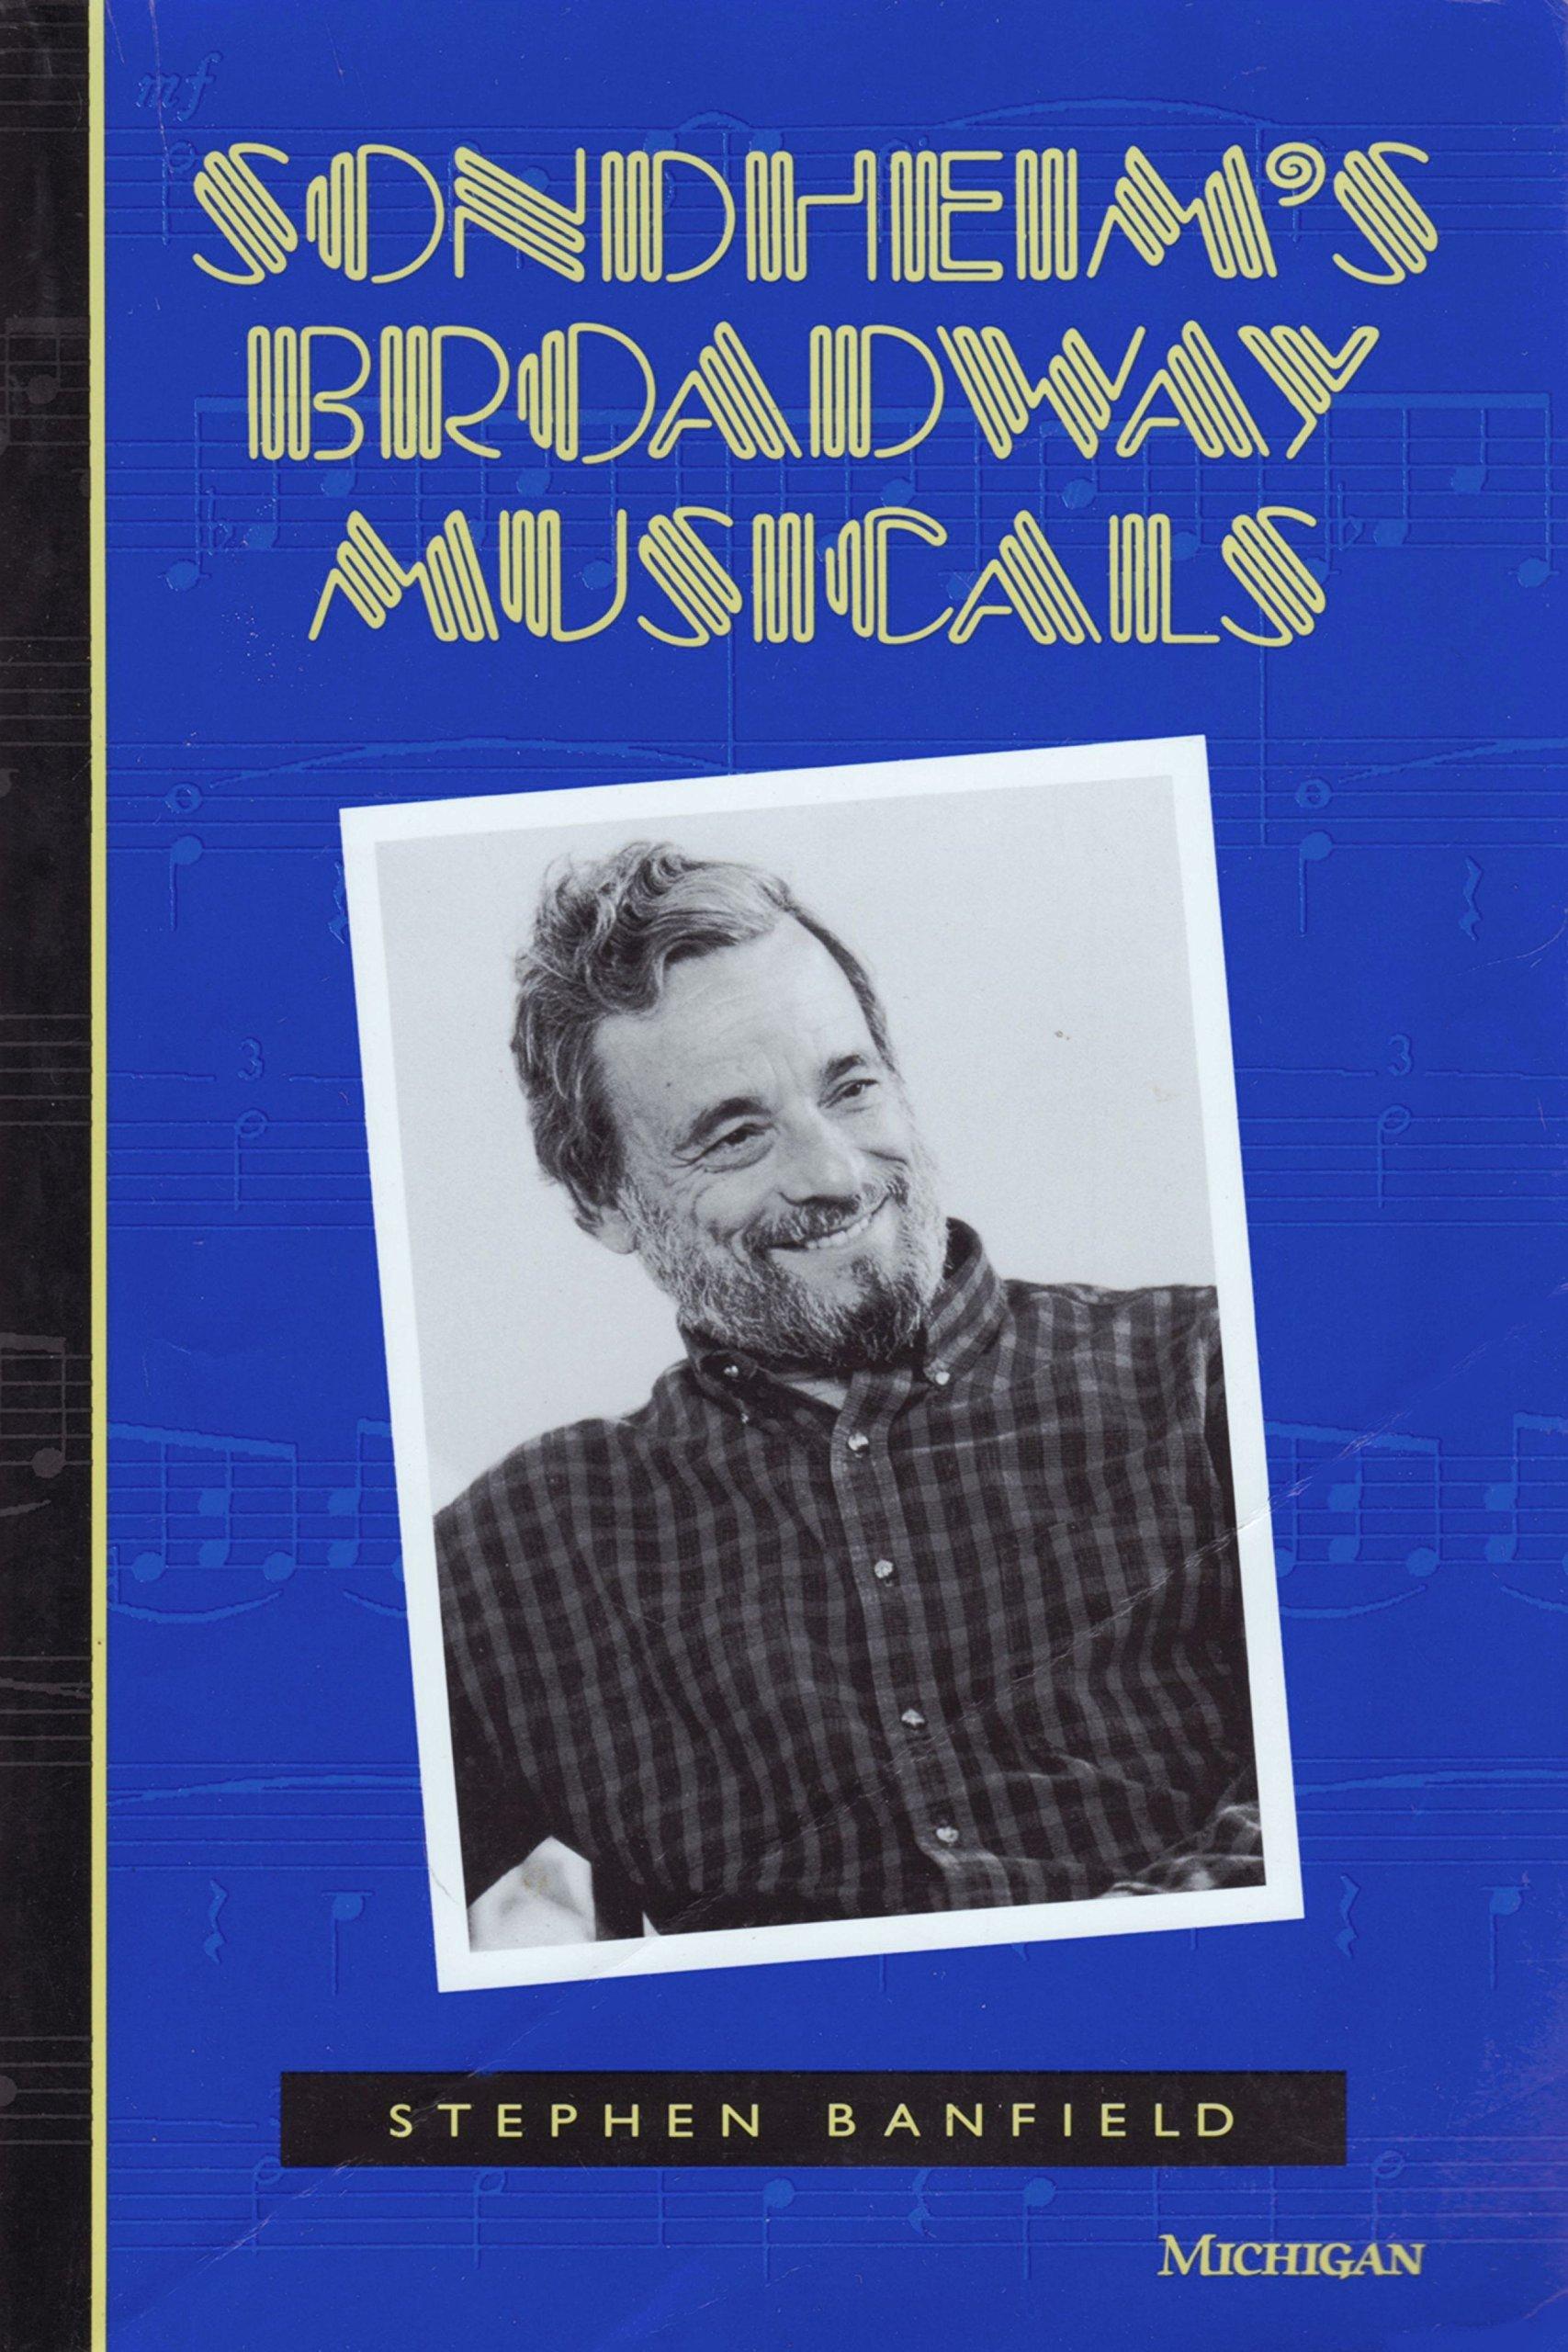 Sondheim's Broadway Musicals (The Michigan American Music)